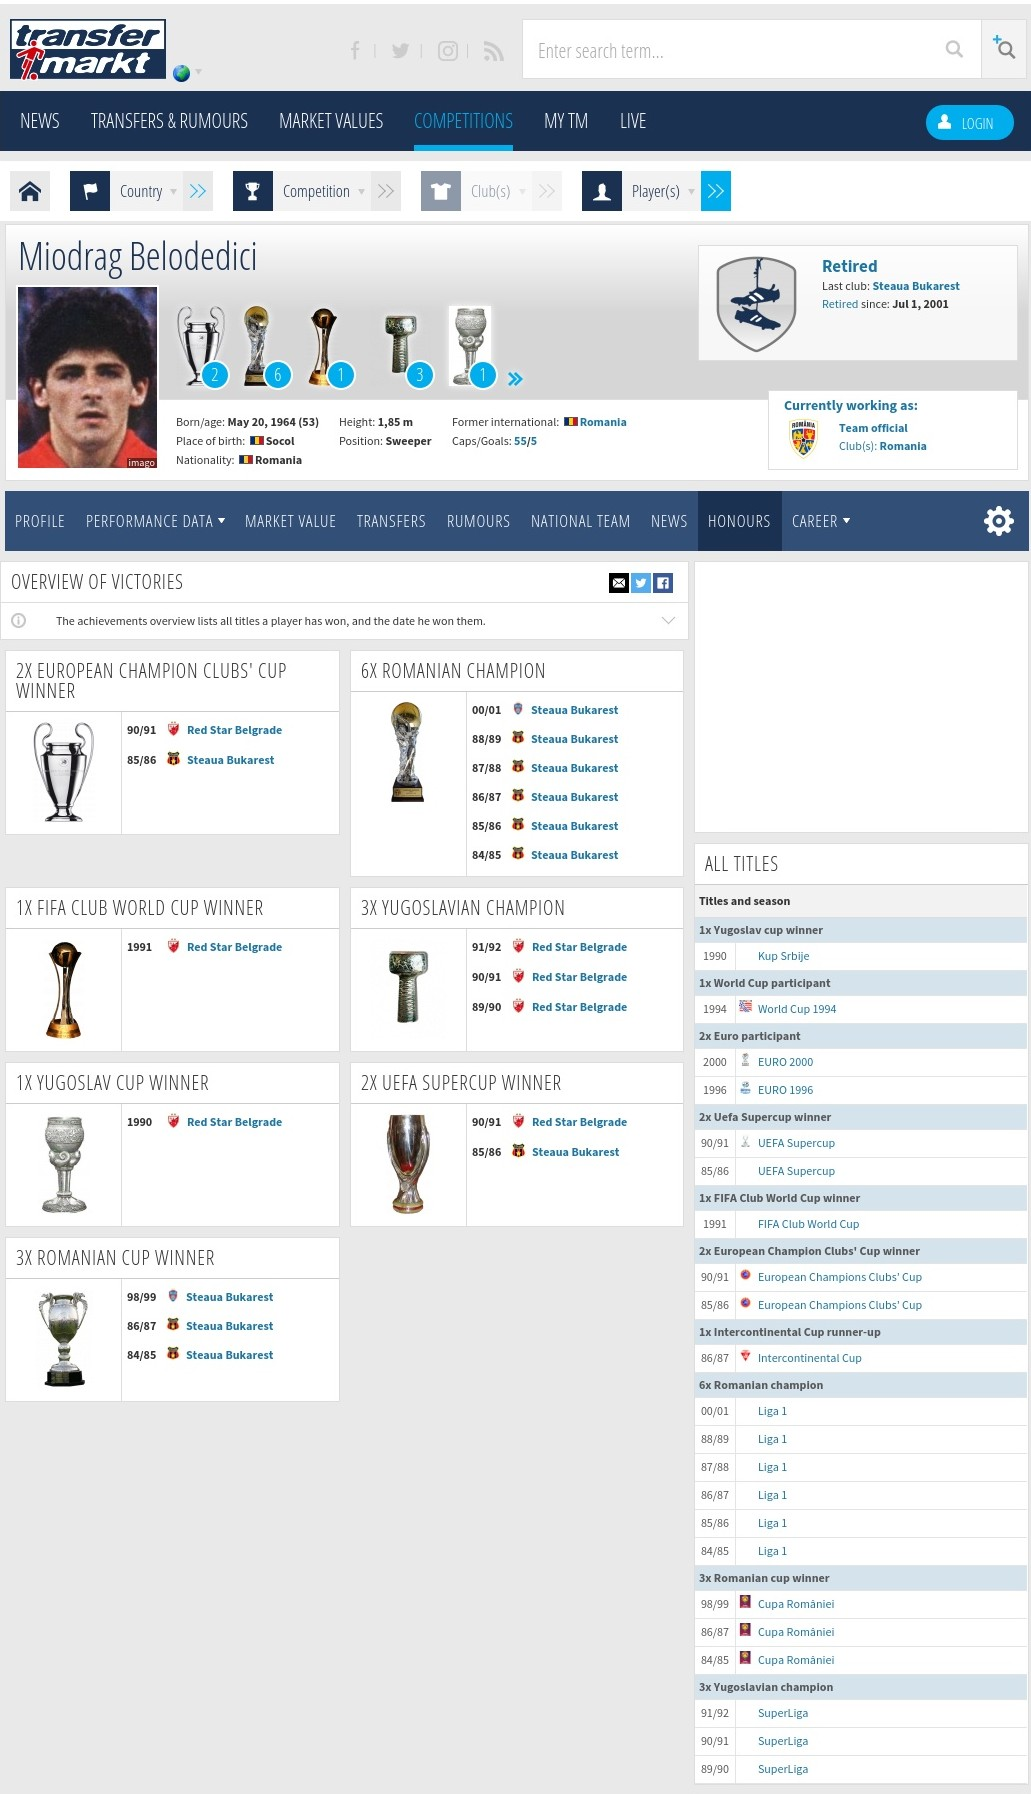 trofee Miodrag Belodedici emblemă fotbal românesc interior